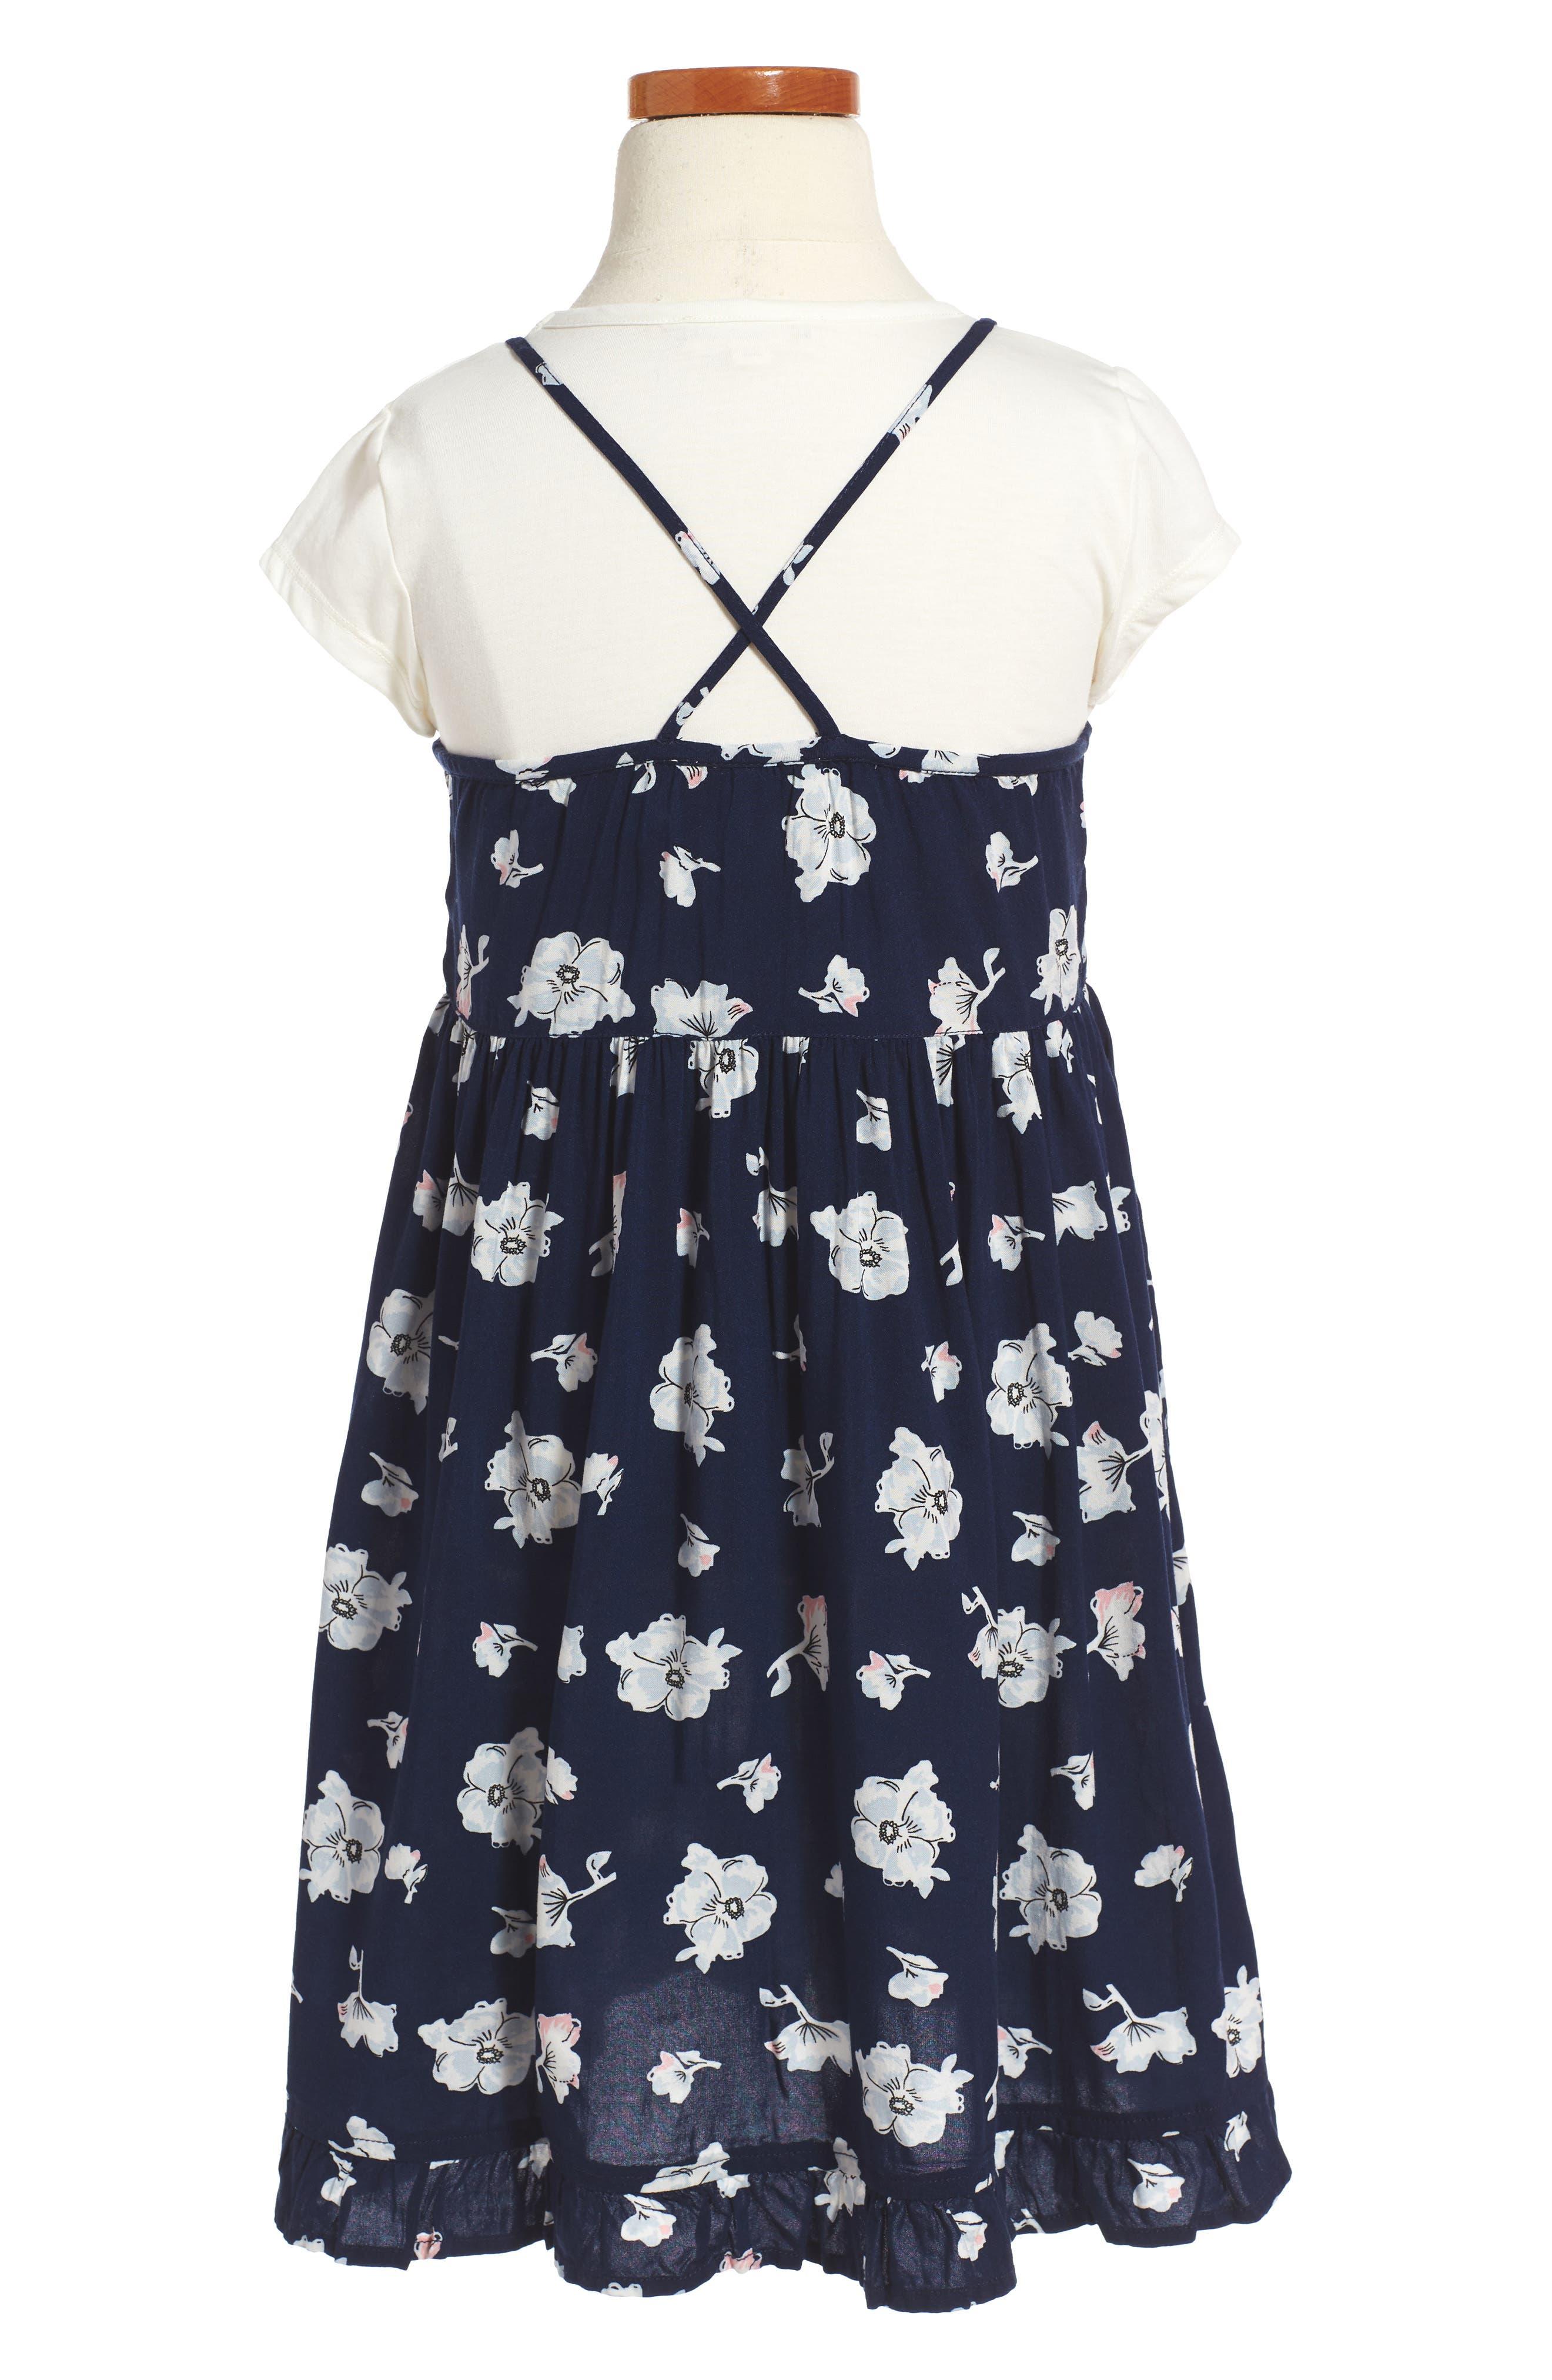 Easy Tee & Dress Set,                             Alternate thumbnail 2, color,                             Navy Peacoat Feminine Floral